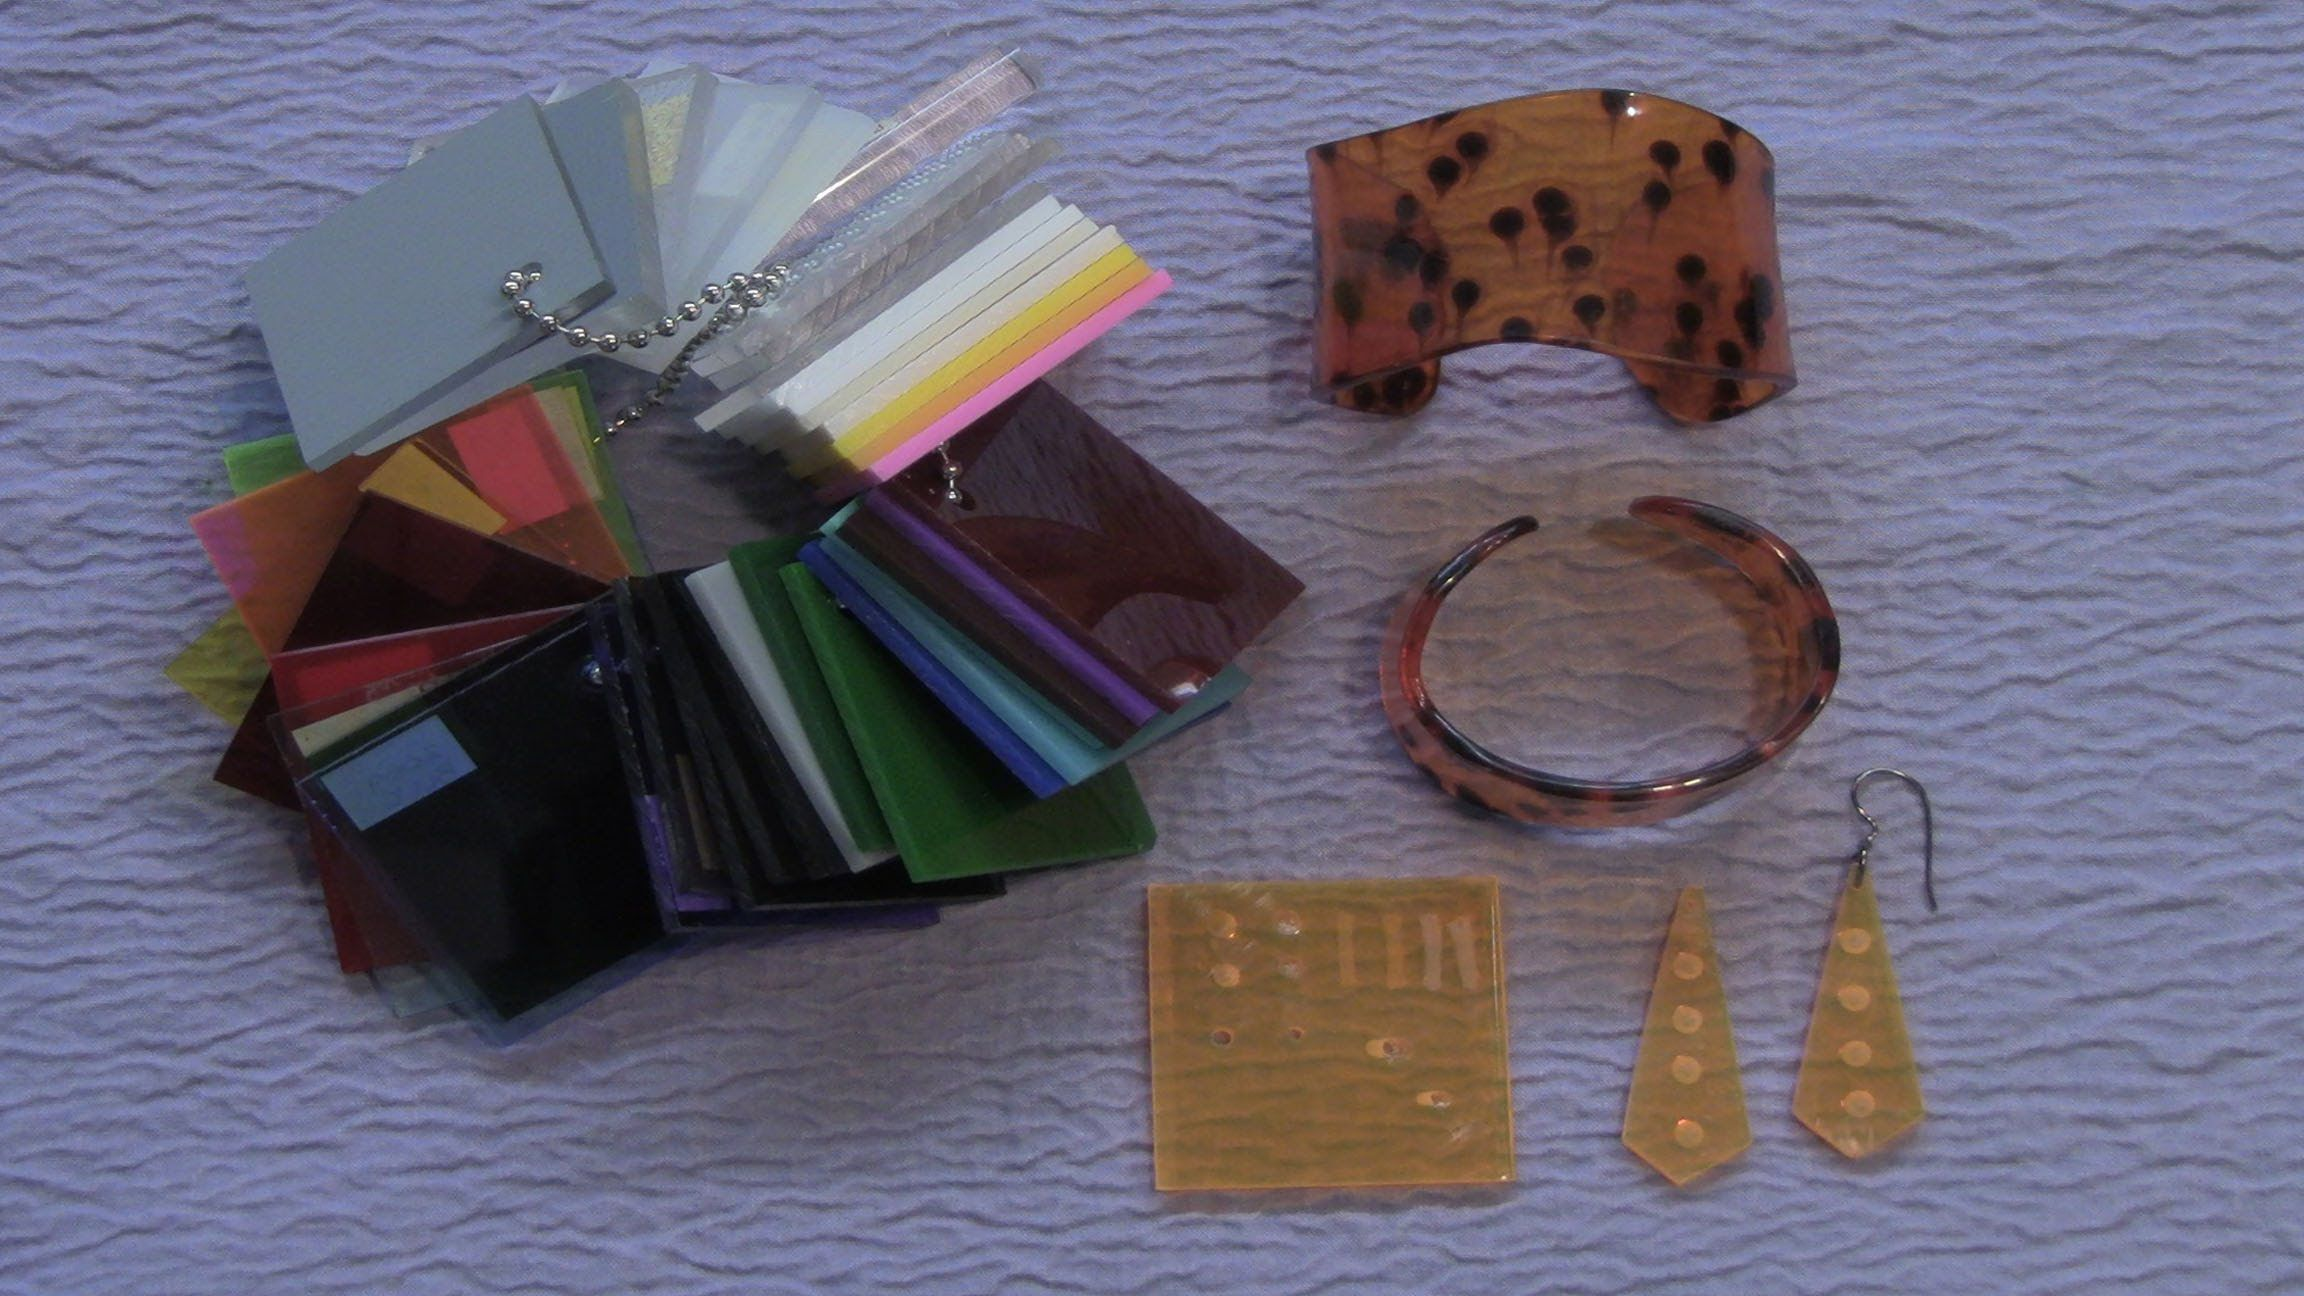 Thermoforming Plexiglass To Create Unique Jewelry Acrylic Jewellery Resin Design Plexiglass